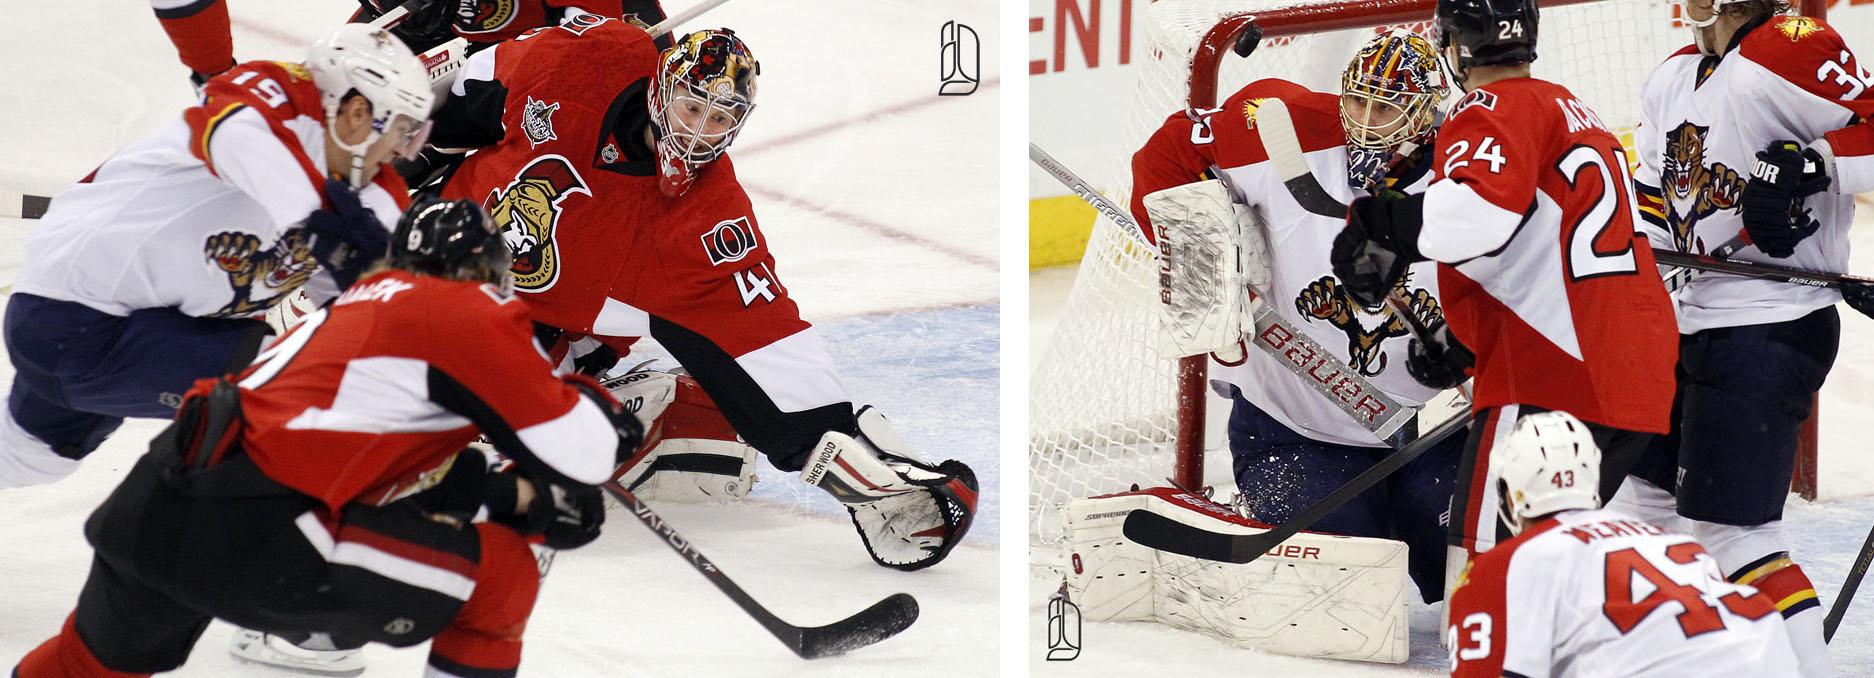 Ottawa Senators' Anderson and Michalek attempt to stop Florida Panthers' Upshall